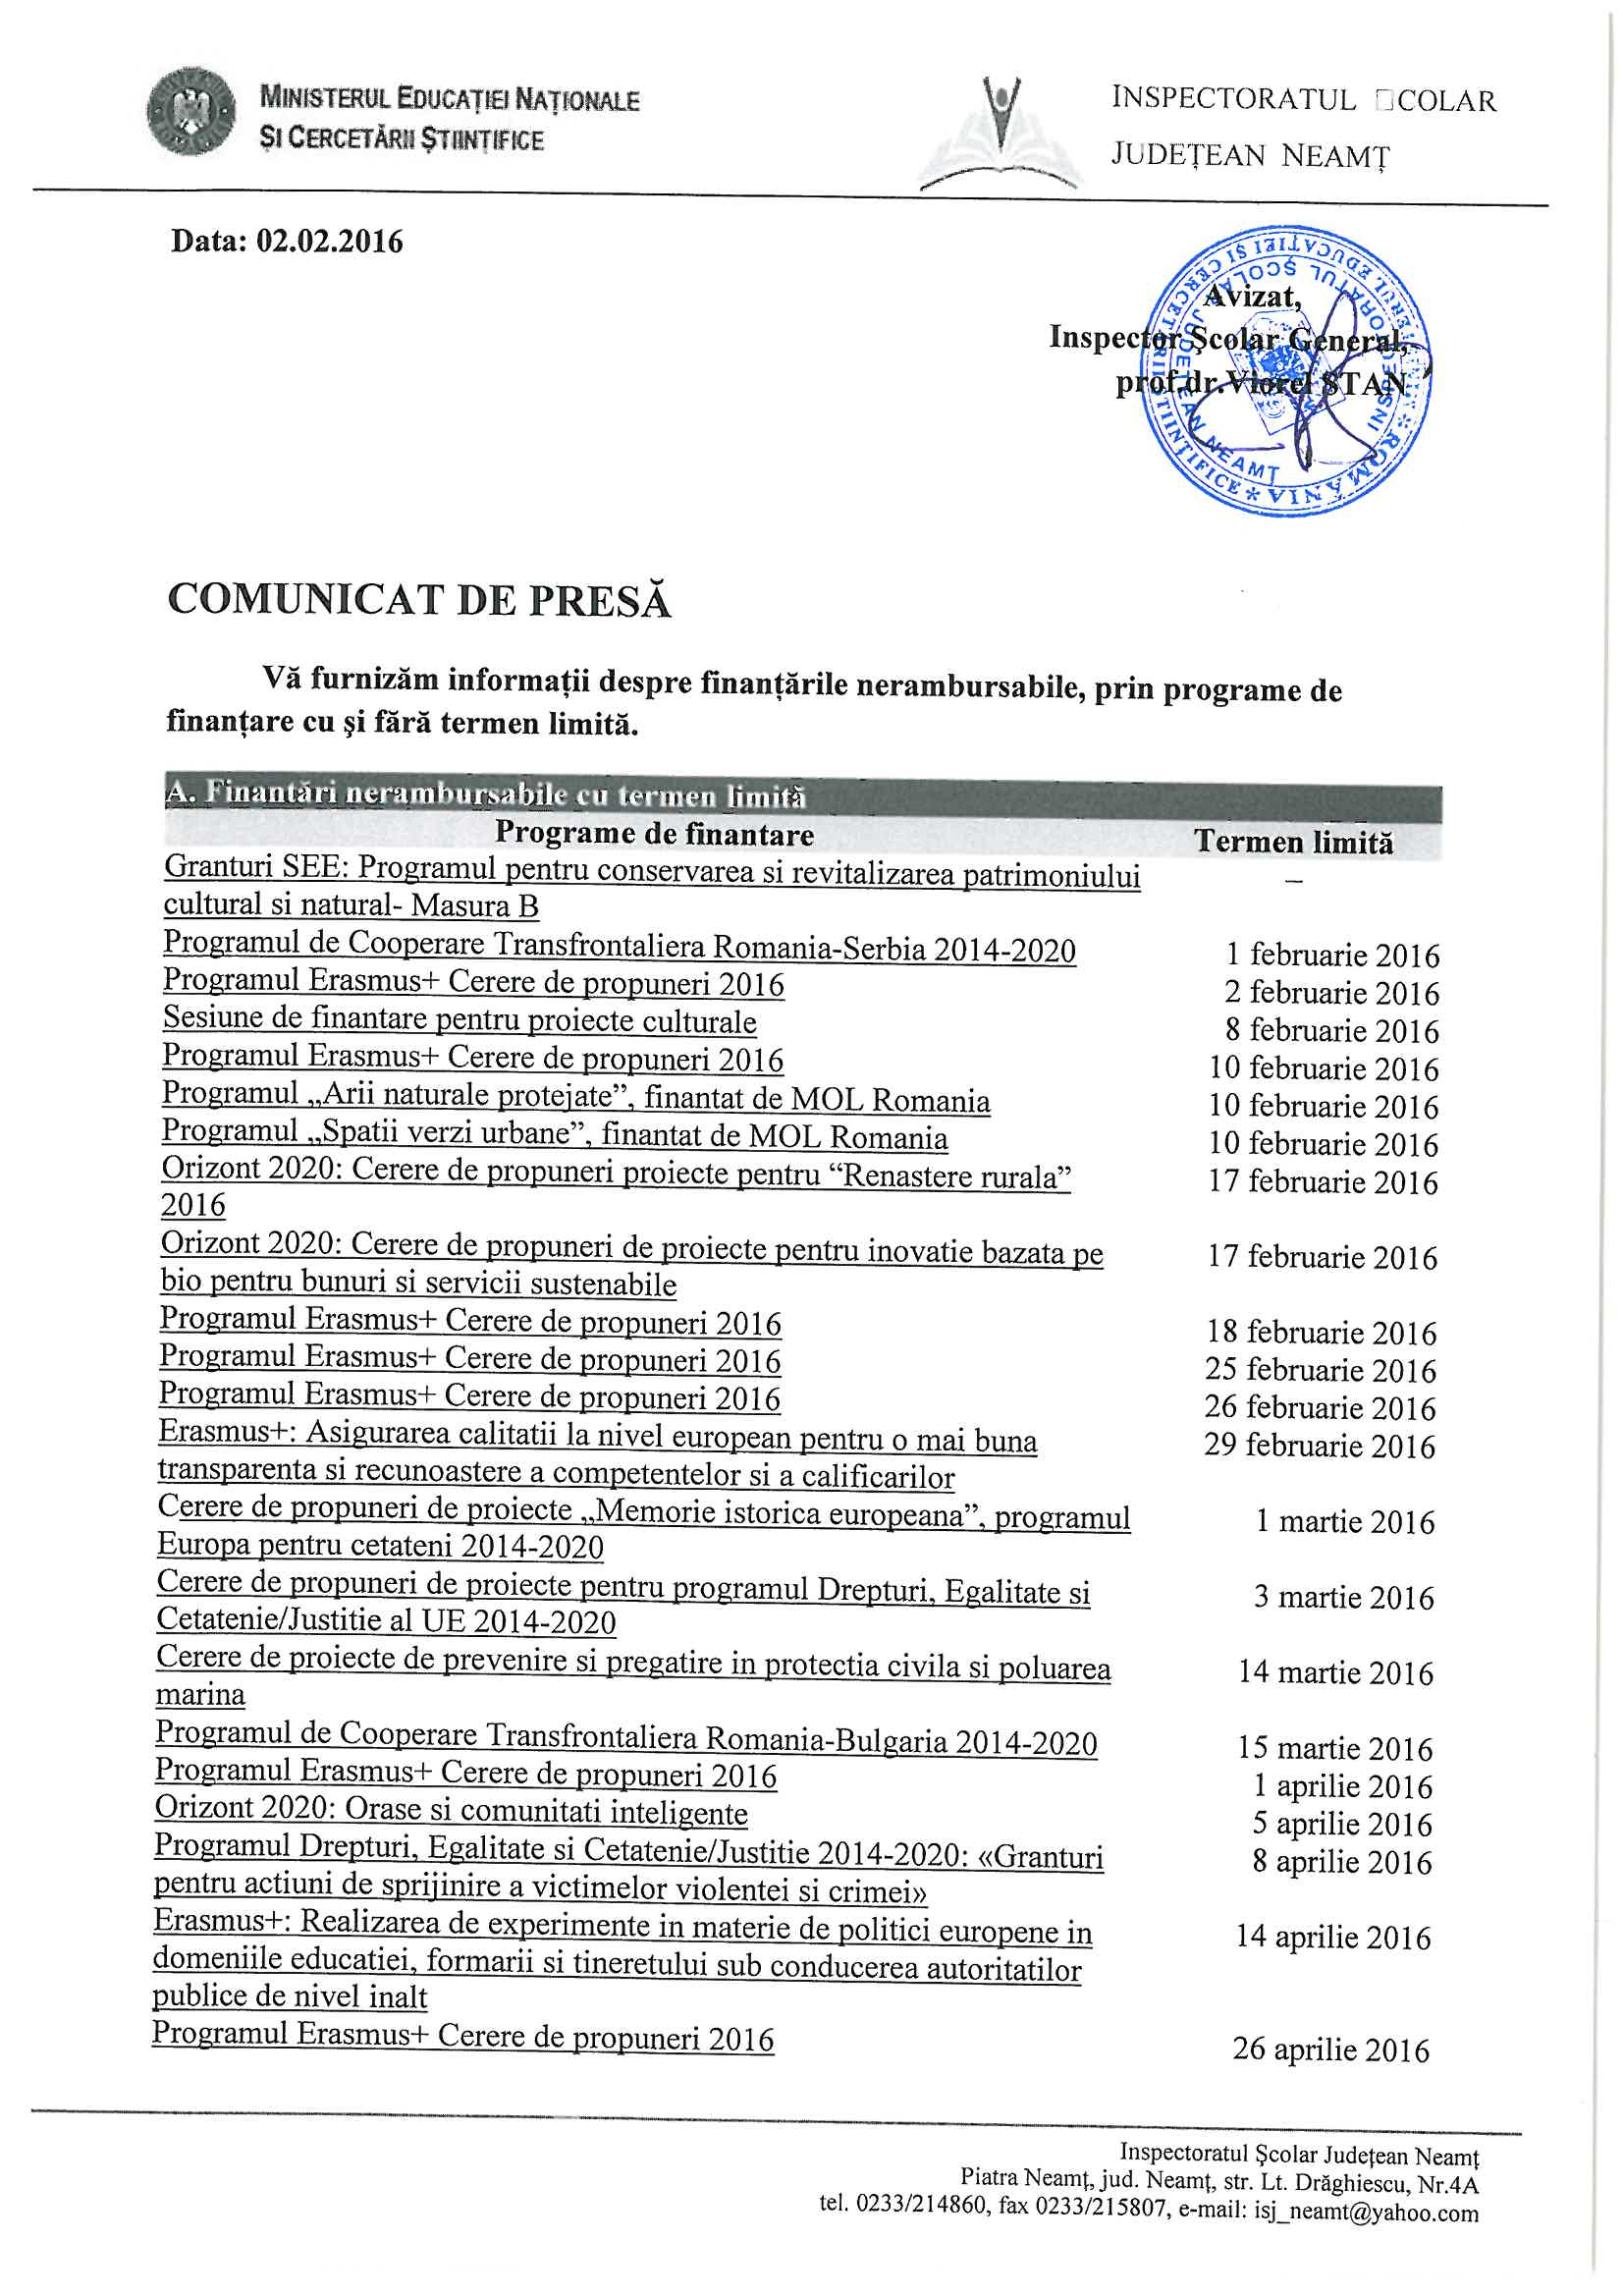 Comunicat de presa - finantari nerambursabile  02.02.2016_Page_1